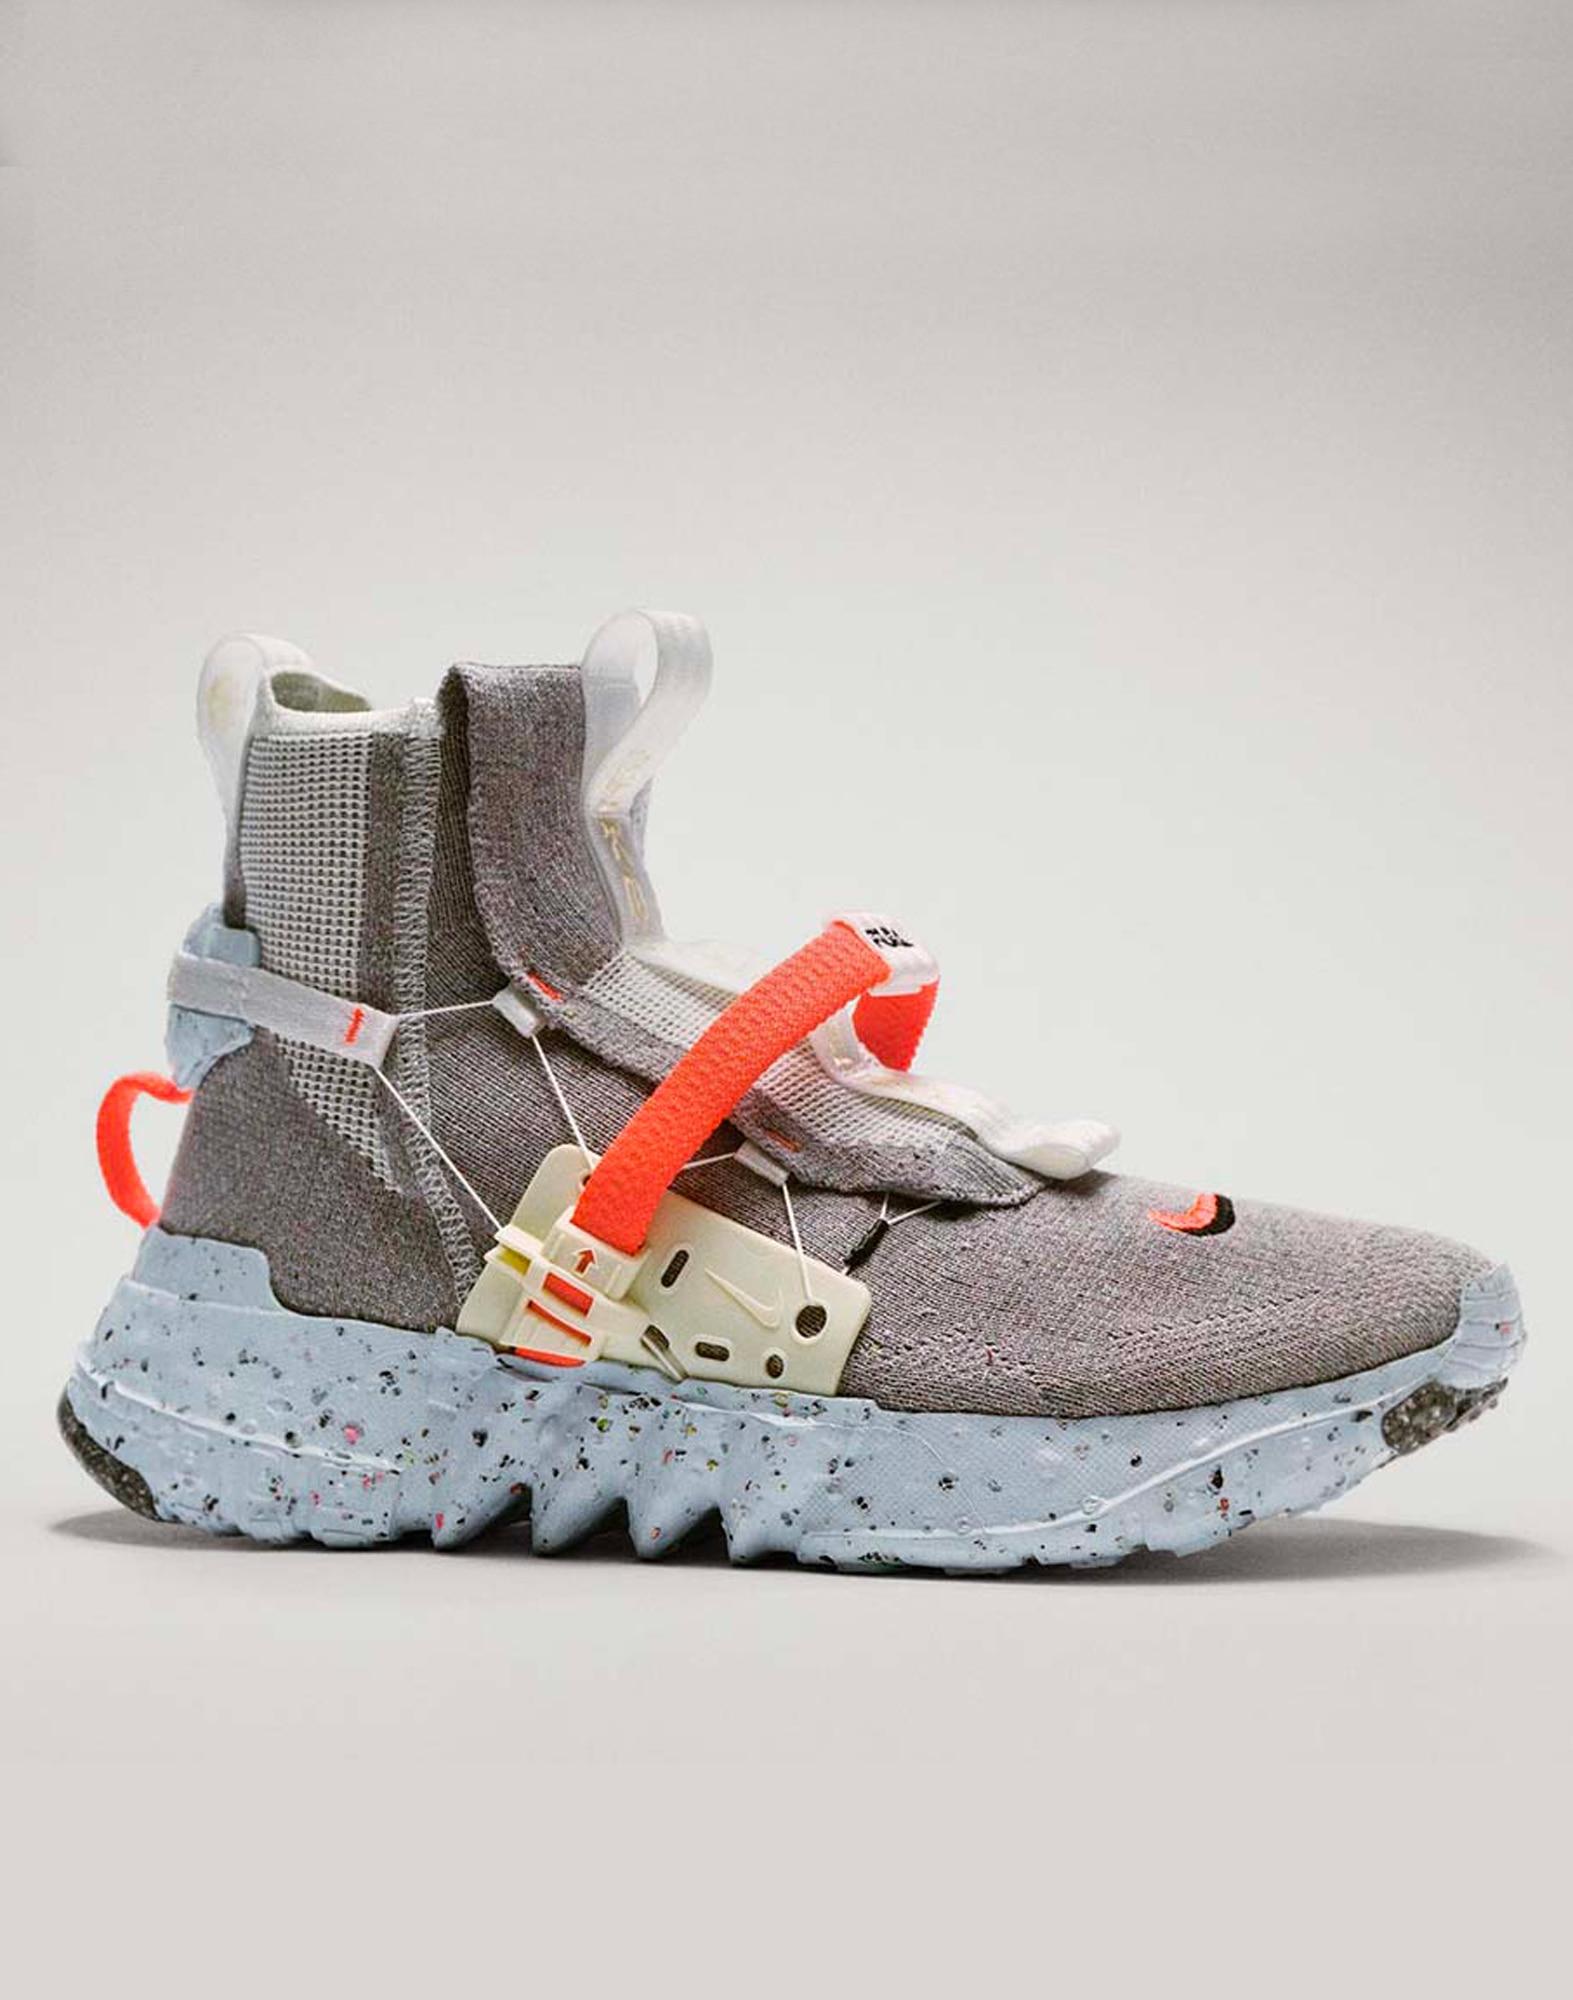 Nike Space Hippie, a first step towards a circular sneaker